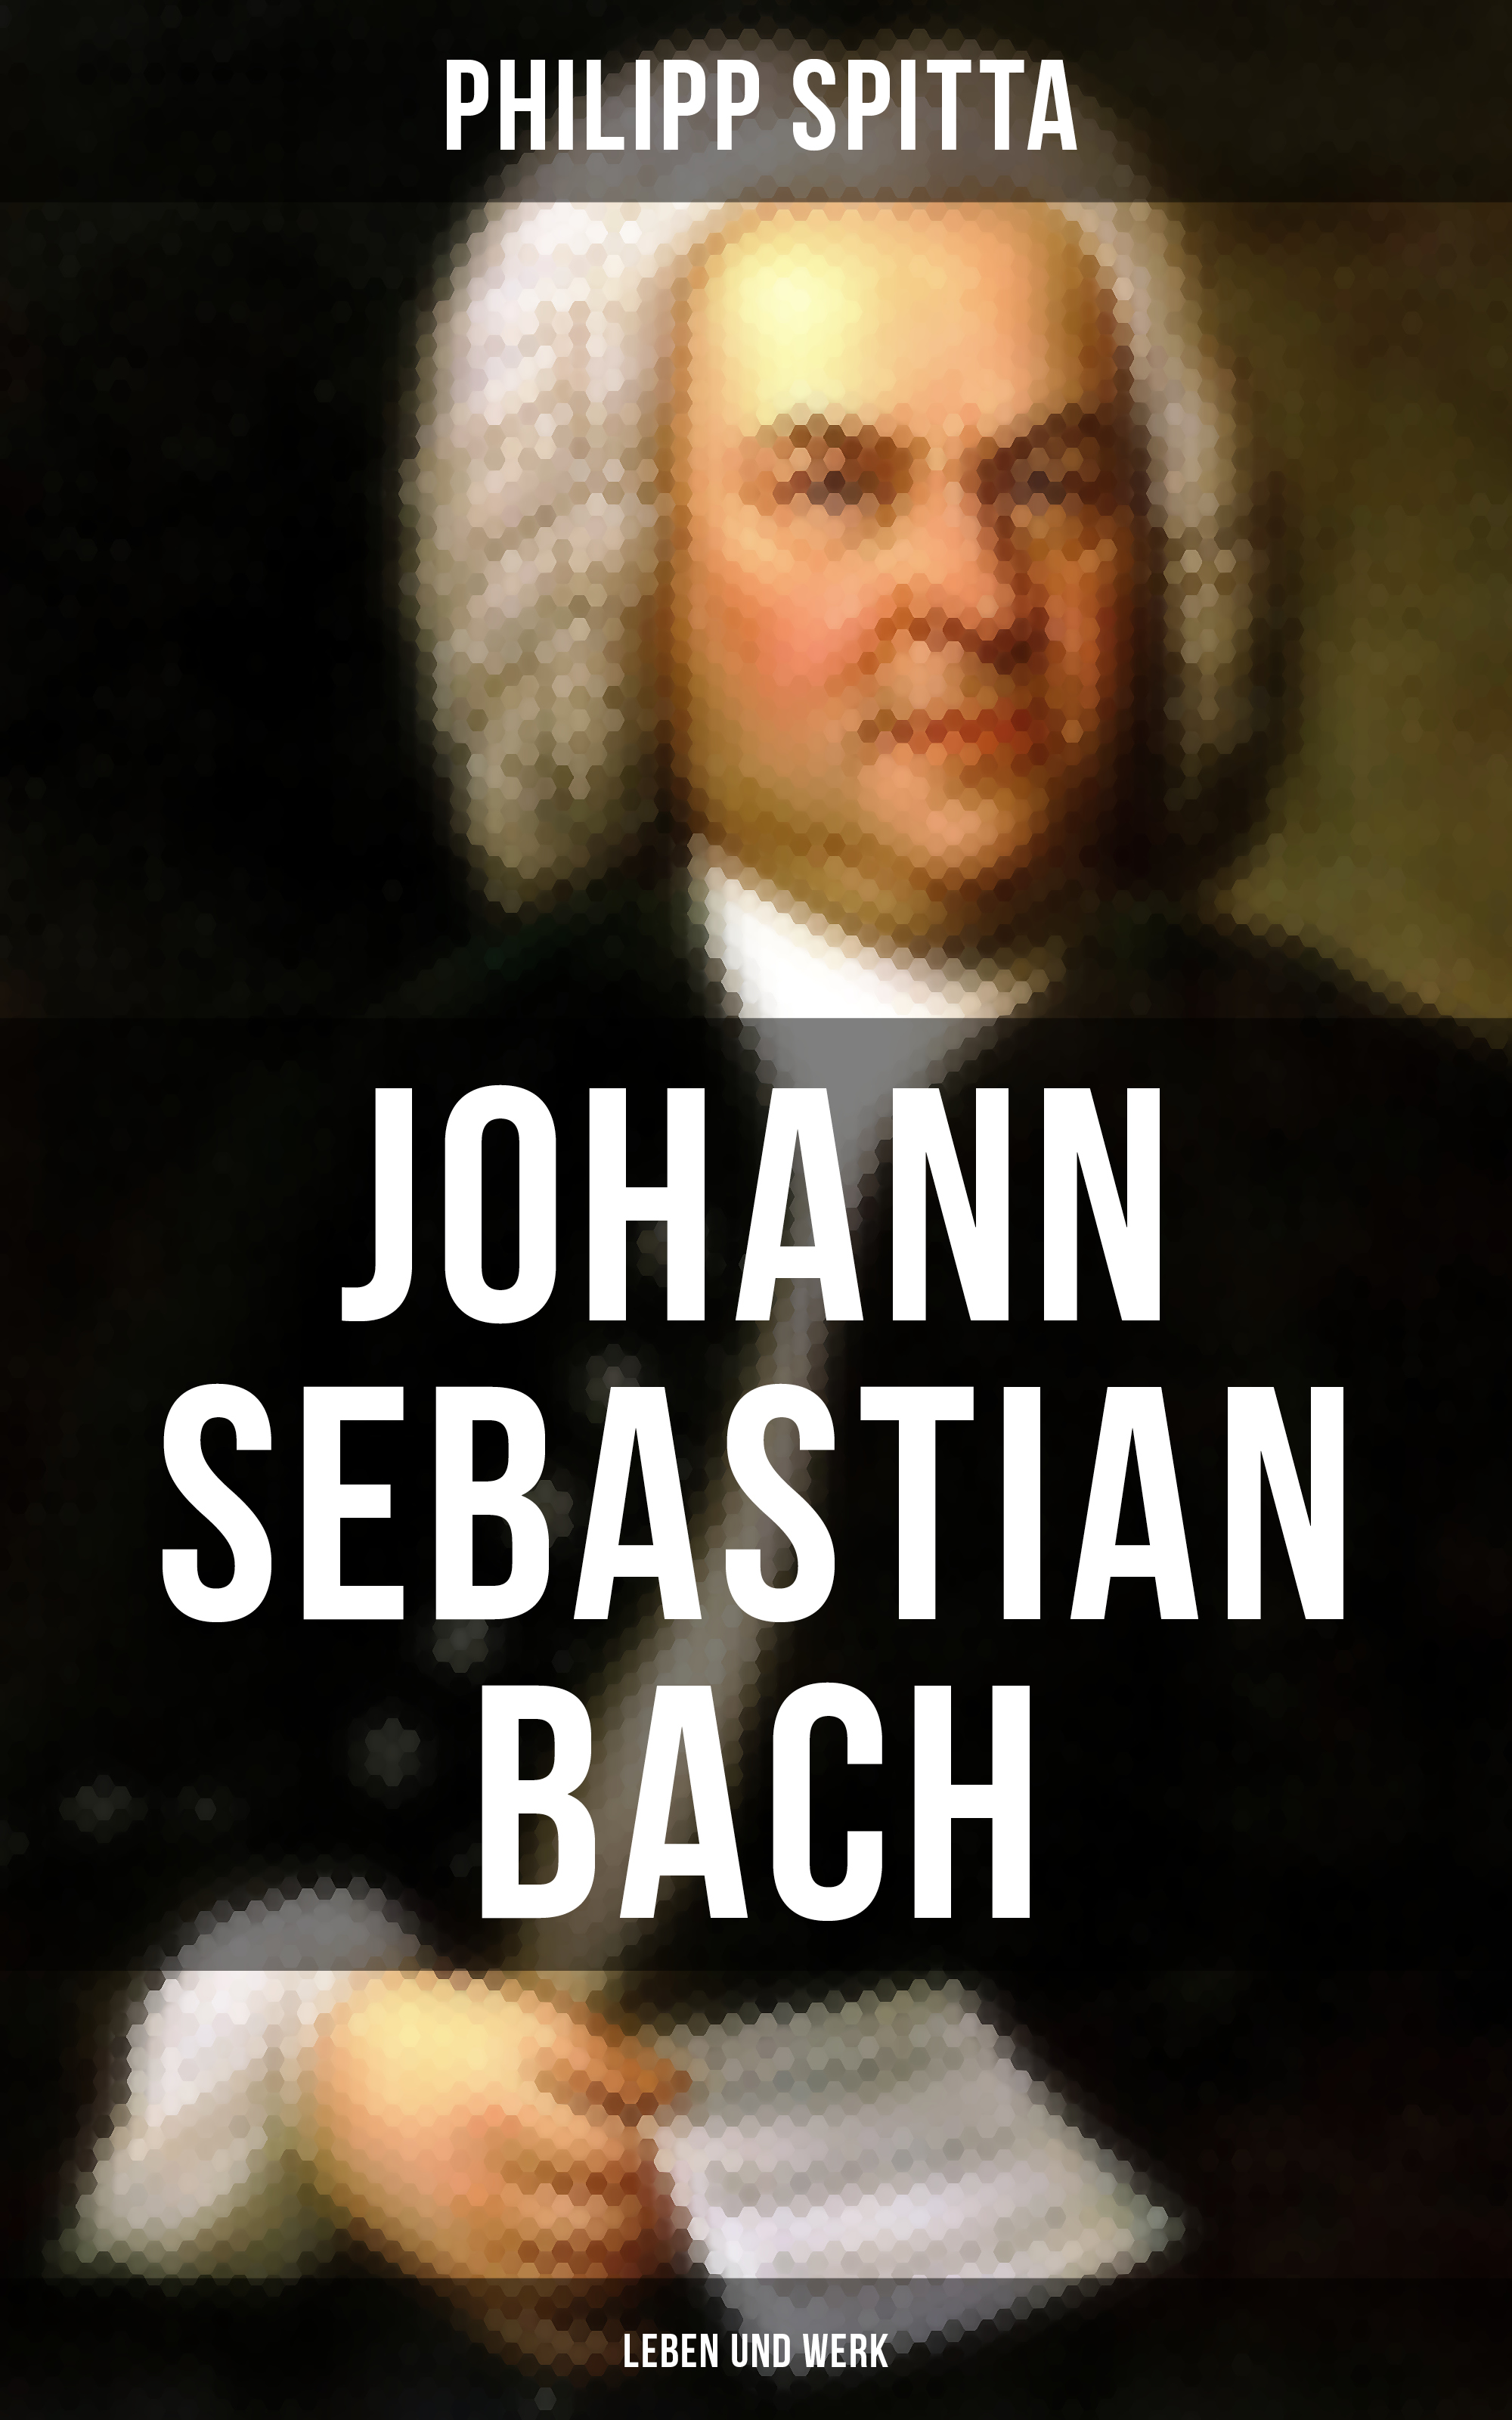 Philipp Spitta Johann Sebastian Bach: Leben und Werk johann repomuk sepp das leben christi volumes 4 5 german edition